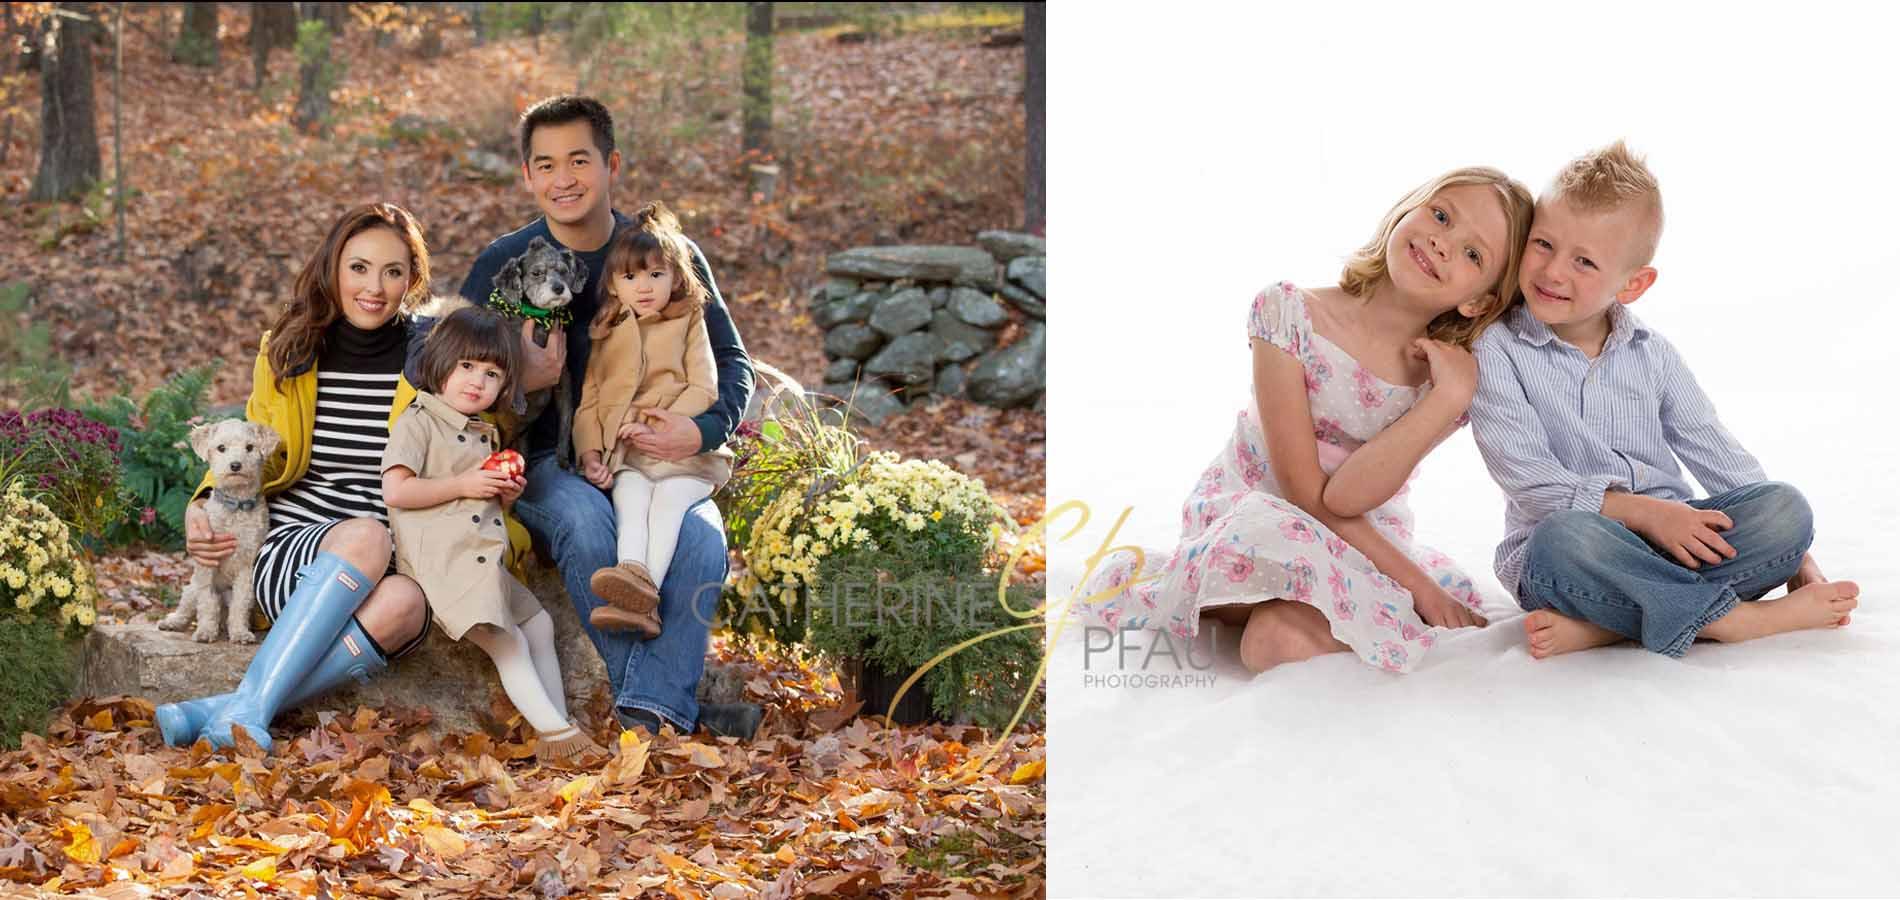 catherinepfauphotography_familyportrait_3.jpg